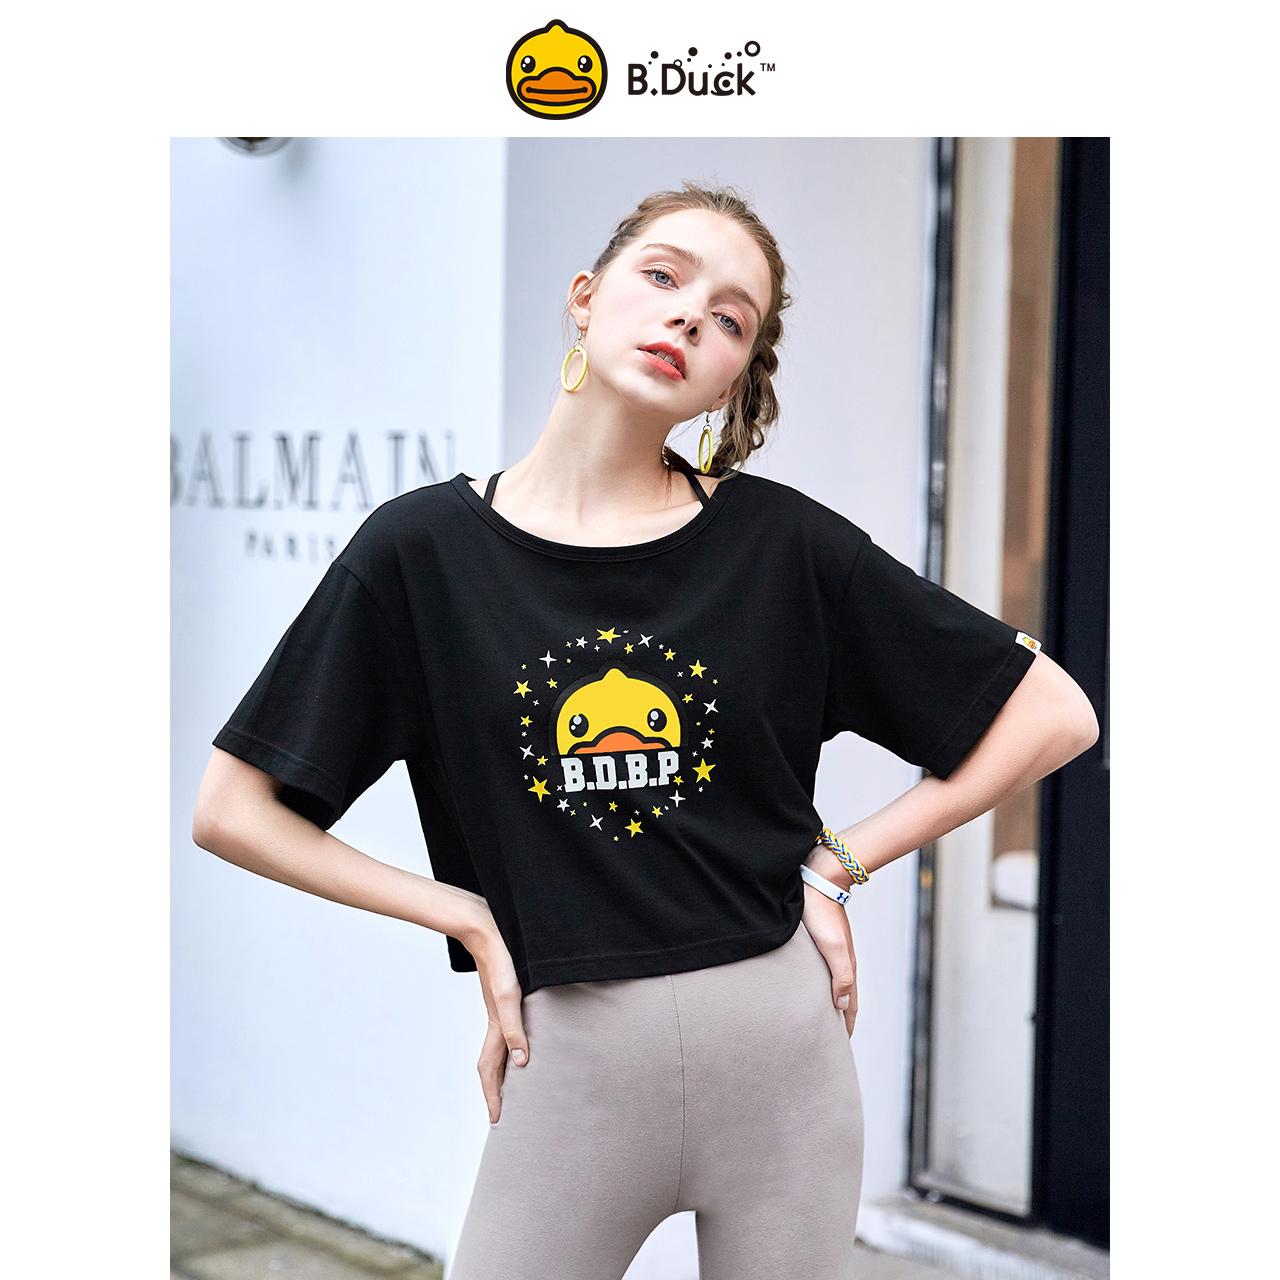 B.Duck小黄鸭2019夏季新品运动风潮酷女款短袖T恤